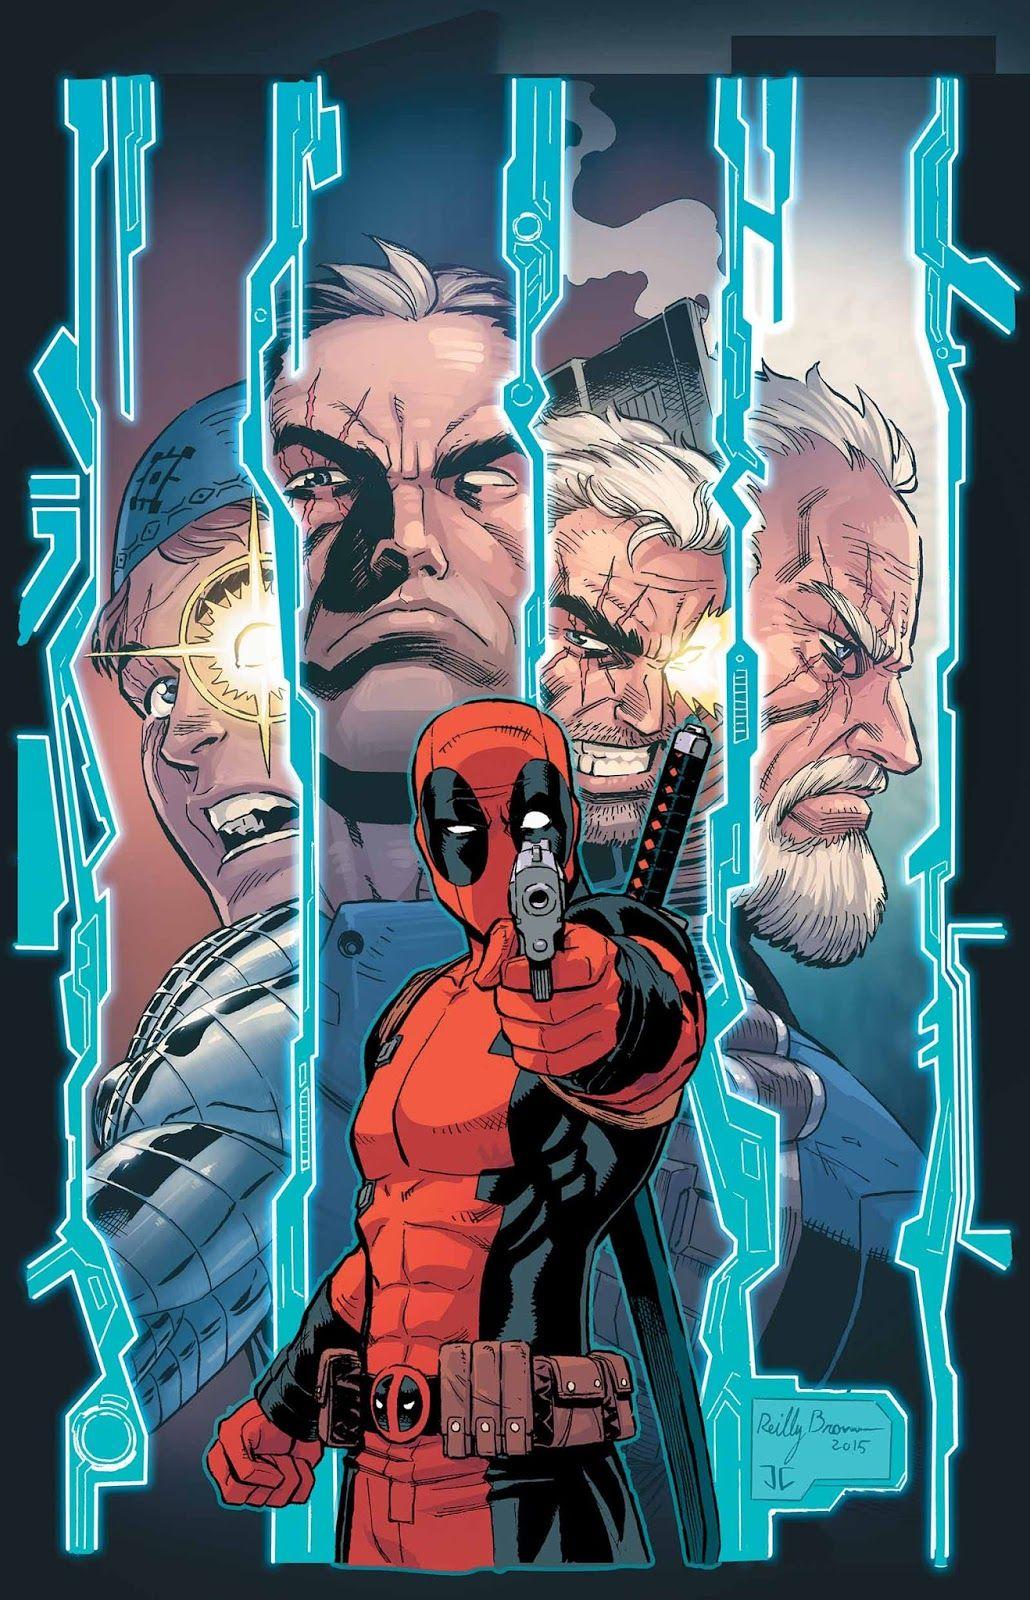 #Deadpool #Fan #Art. (Deadpool & Cable: Split Second Vol.1 #3 Variant Cover) By: Reilly Brown. (THE * 3 * STÅR * ÅWARD OF: AW YEAH, IT'S MAJOR ÅWESOMENESS!!!™)[THANK Ü 4 PINNING!!!<·><]<©>ÅÅÅ+(OB4E)